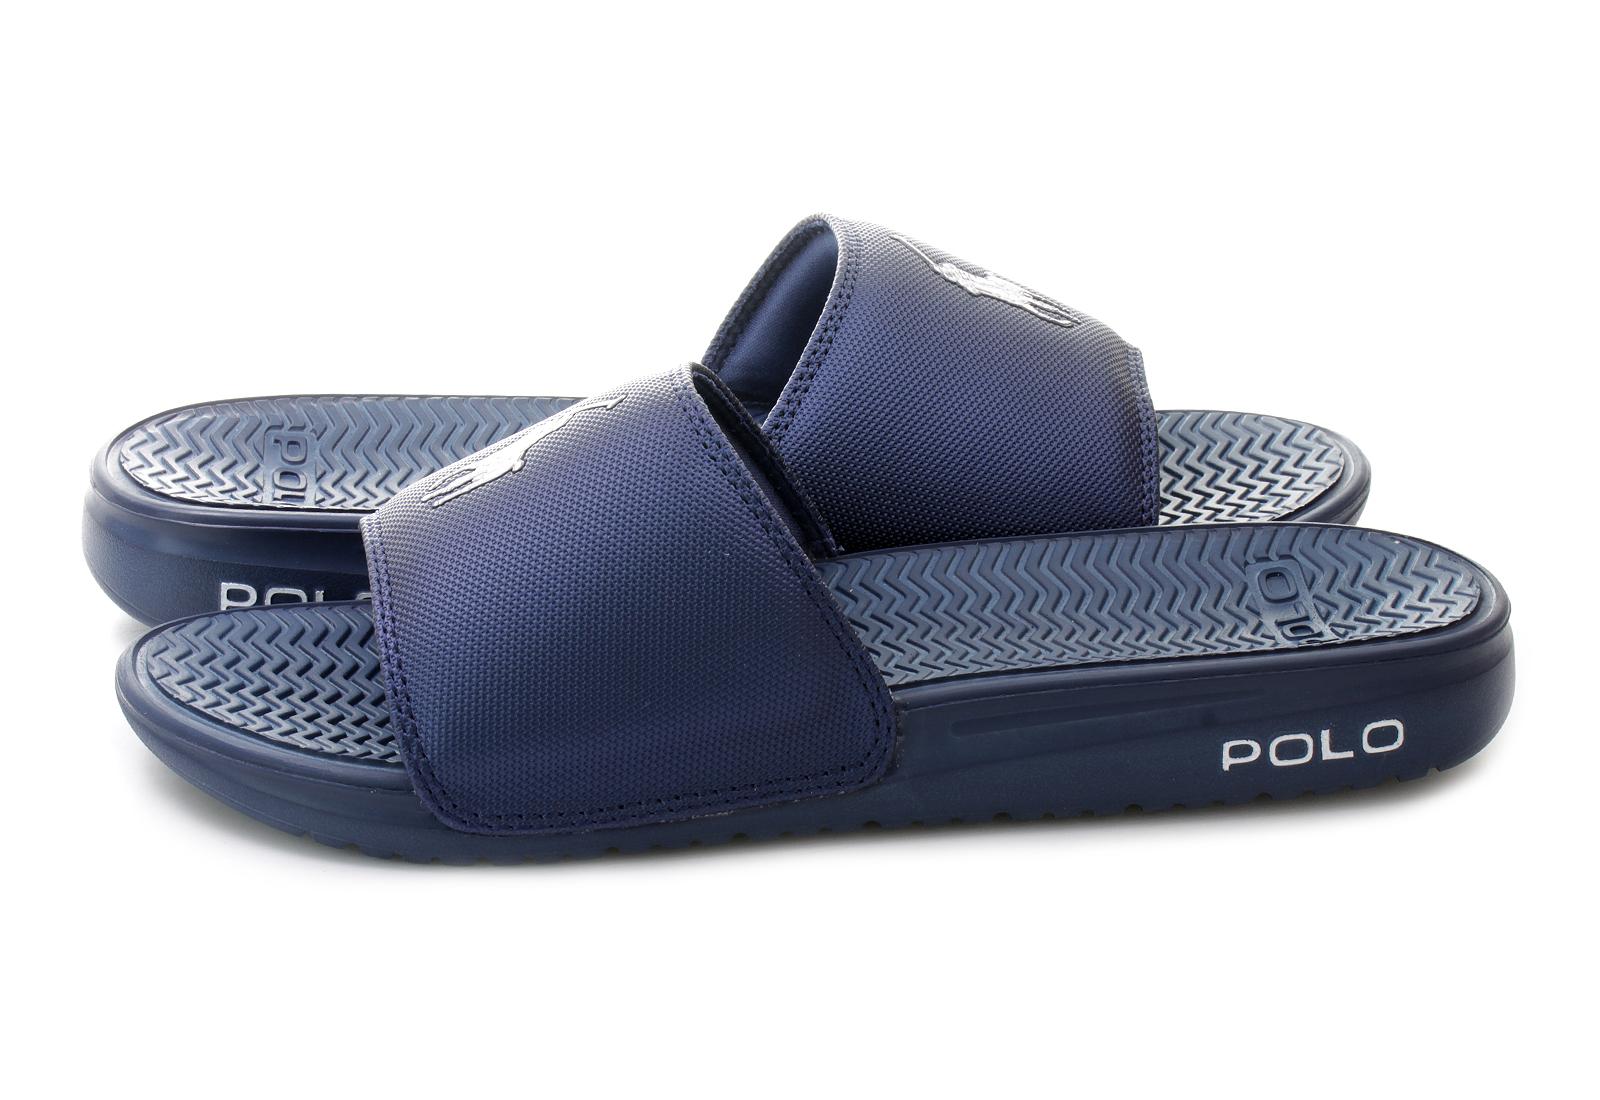 Ralph Lauren White Shoes Price